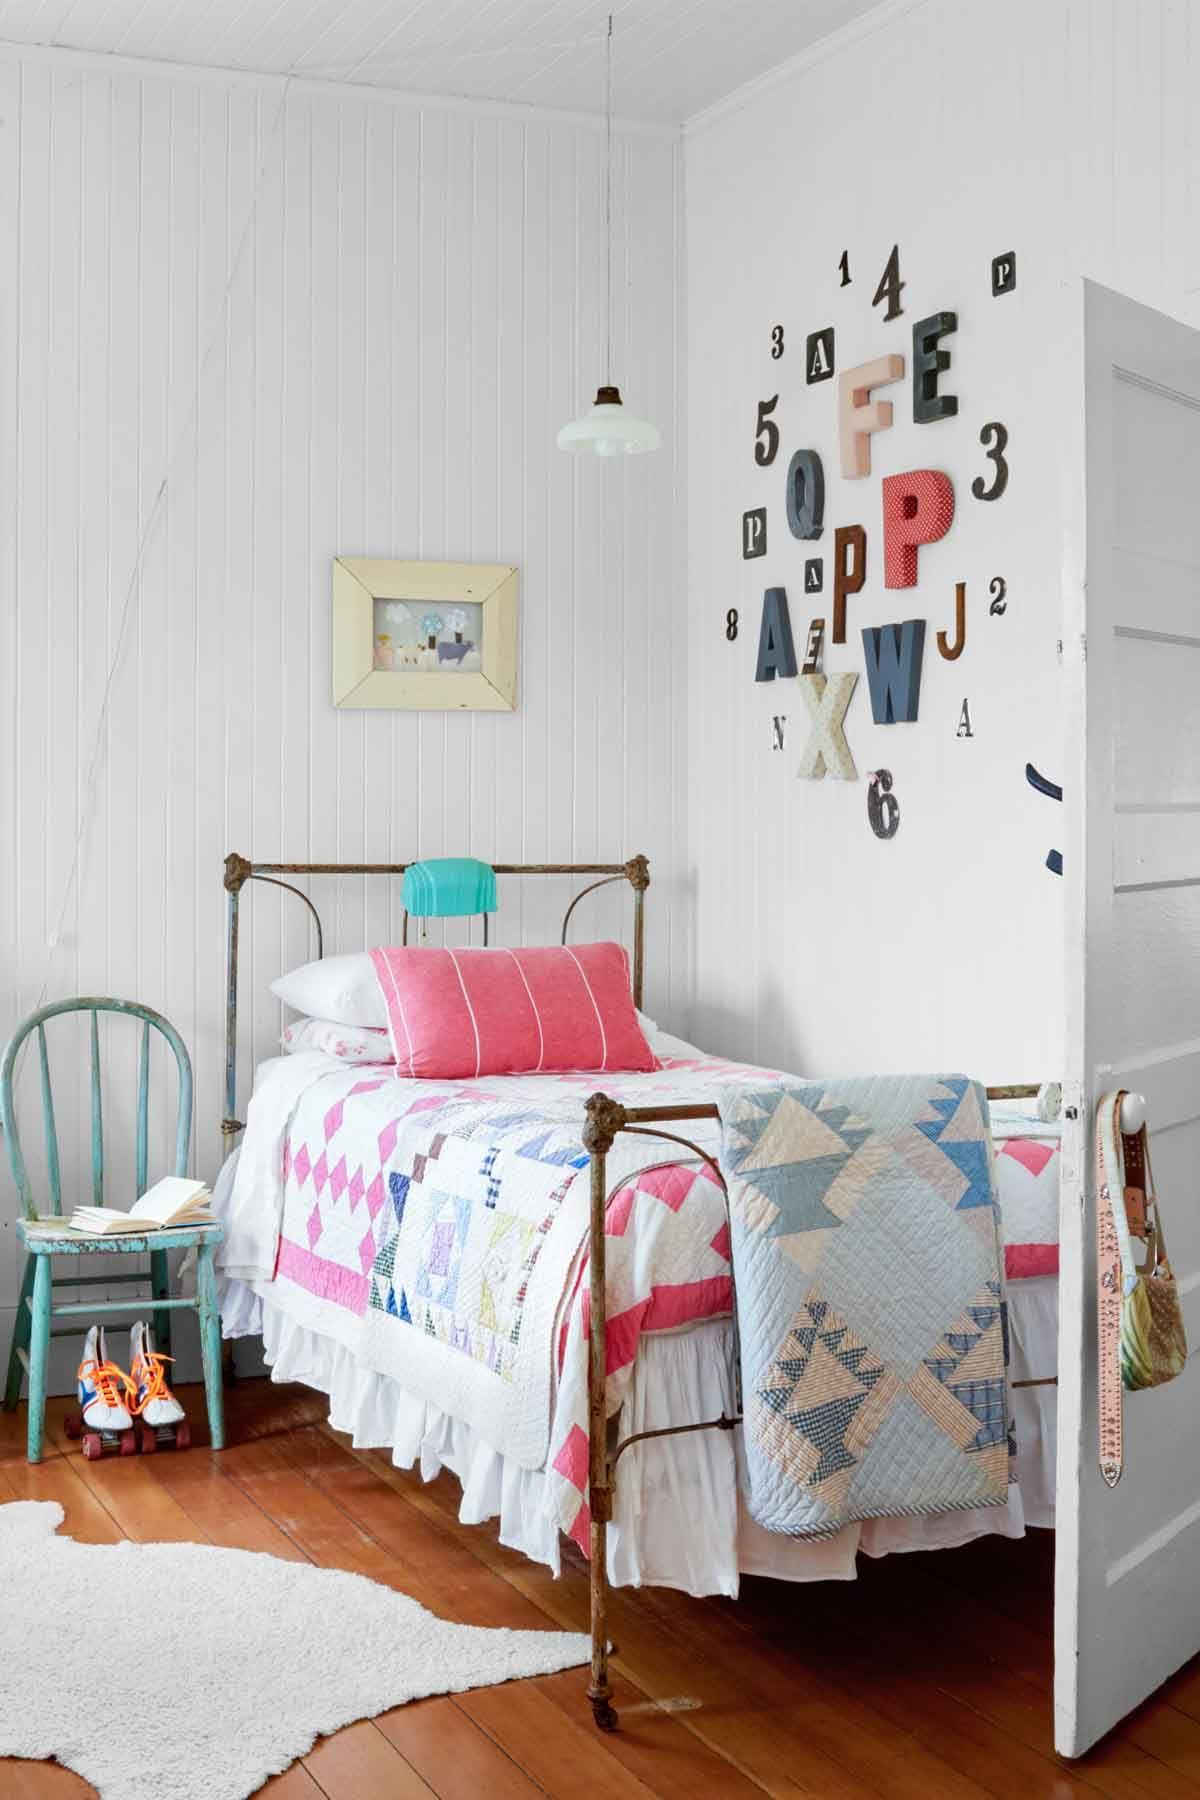 girl bedroom ideas & 12 Fun Girl\u0027s Bedroom Decor Ideas - Cute Room Decorating for Girls